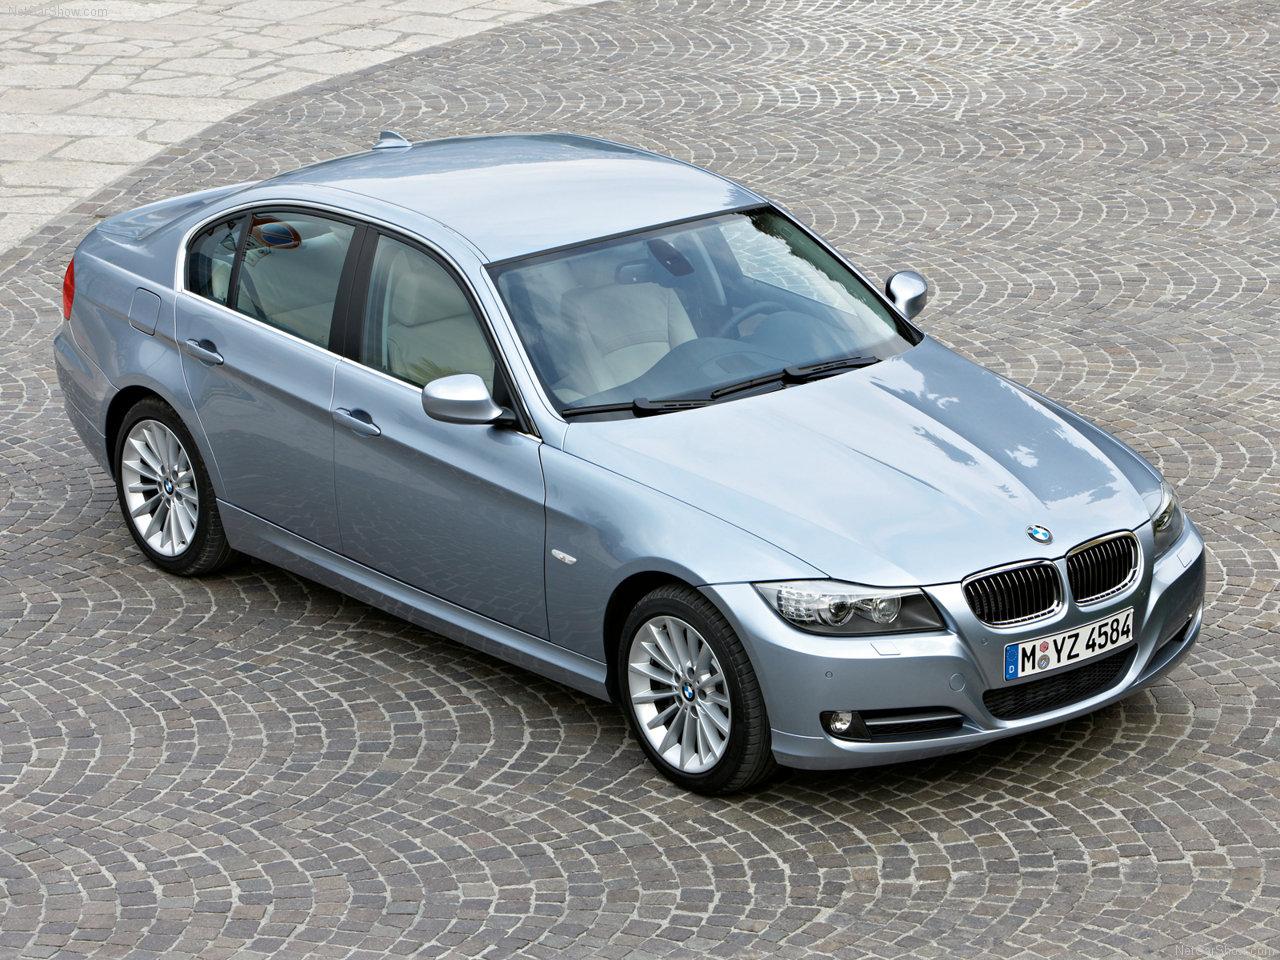 http://1.bp.blogspot.com/_WDRV2DMuP0Y/TTLkAmPyC0I/AAAAAAAABno/R4Td80CYqIY/s1600/BMW-3-Series_2009_1280x960_wallpaper_03.jpg